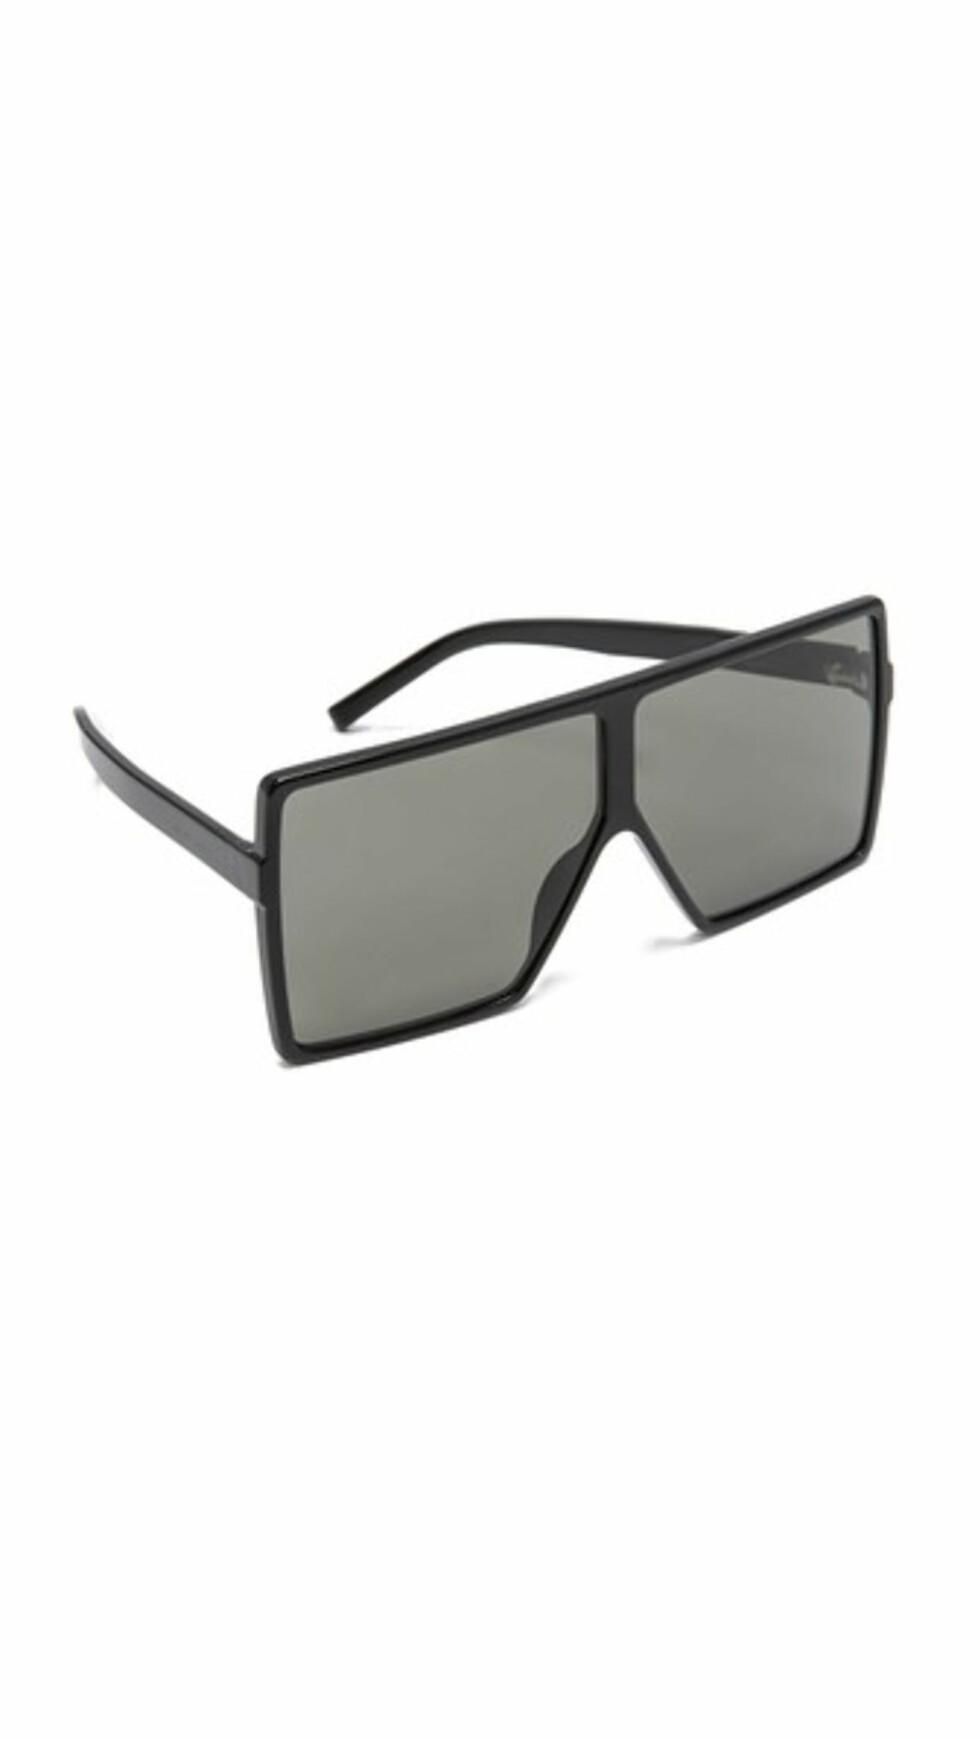 Solbriller fra Saint Laurent via Shopbop.com   kr 4099   https://www.shopbop.com/183-betty-sunglasses-saint-laurent/vp/v=1/1501923865.htm?folderID=13558&fm=other-viewall&os=false&colorId=13178